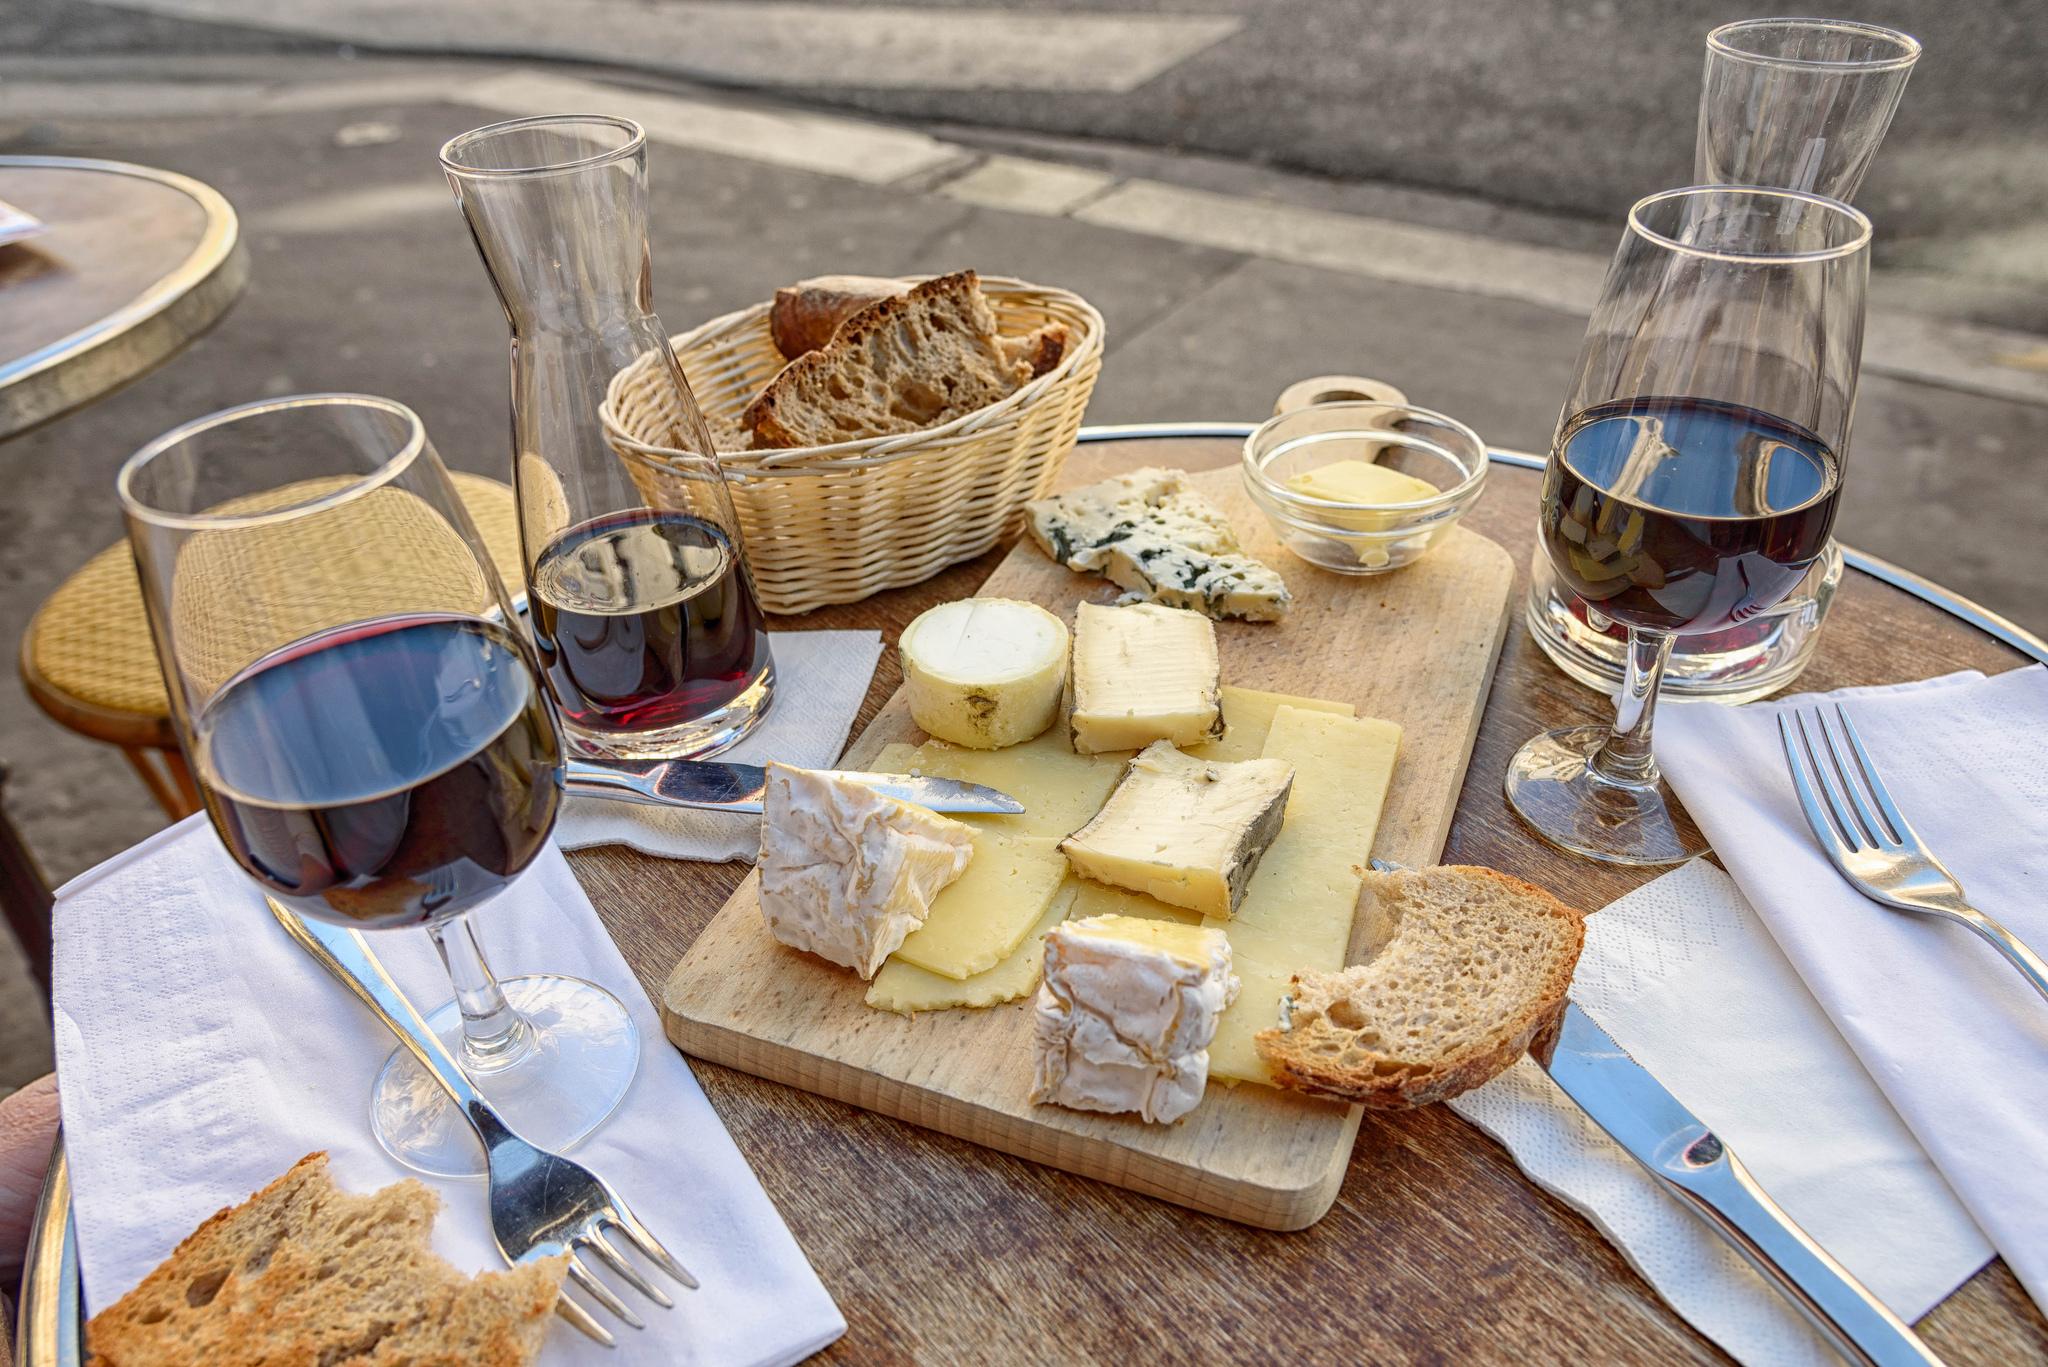 Cheese, Wine and Bread | © Joe deSousa/Flickr